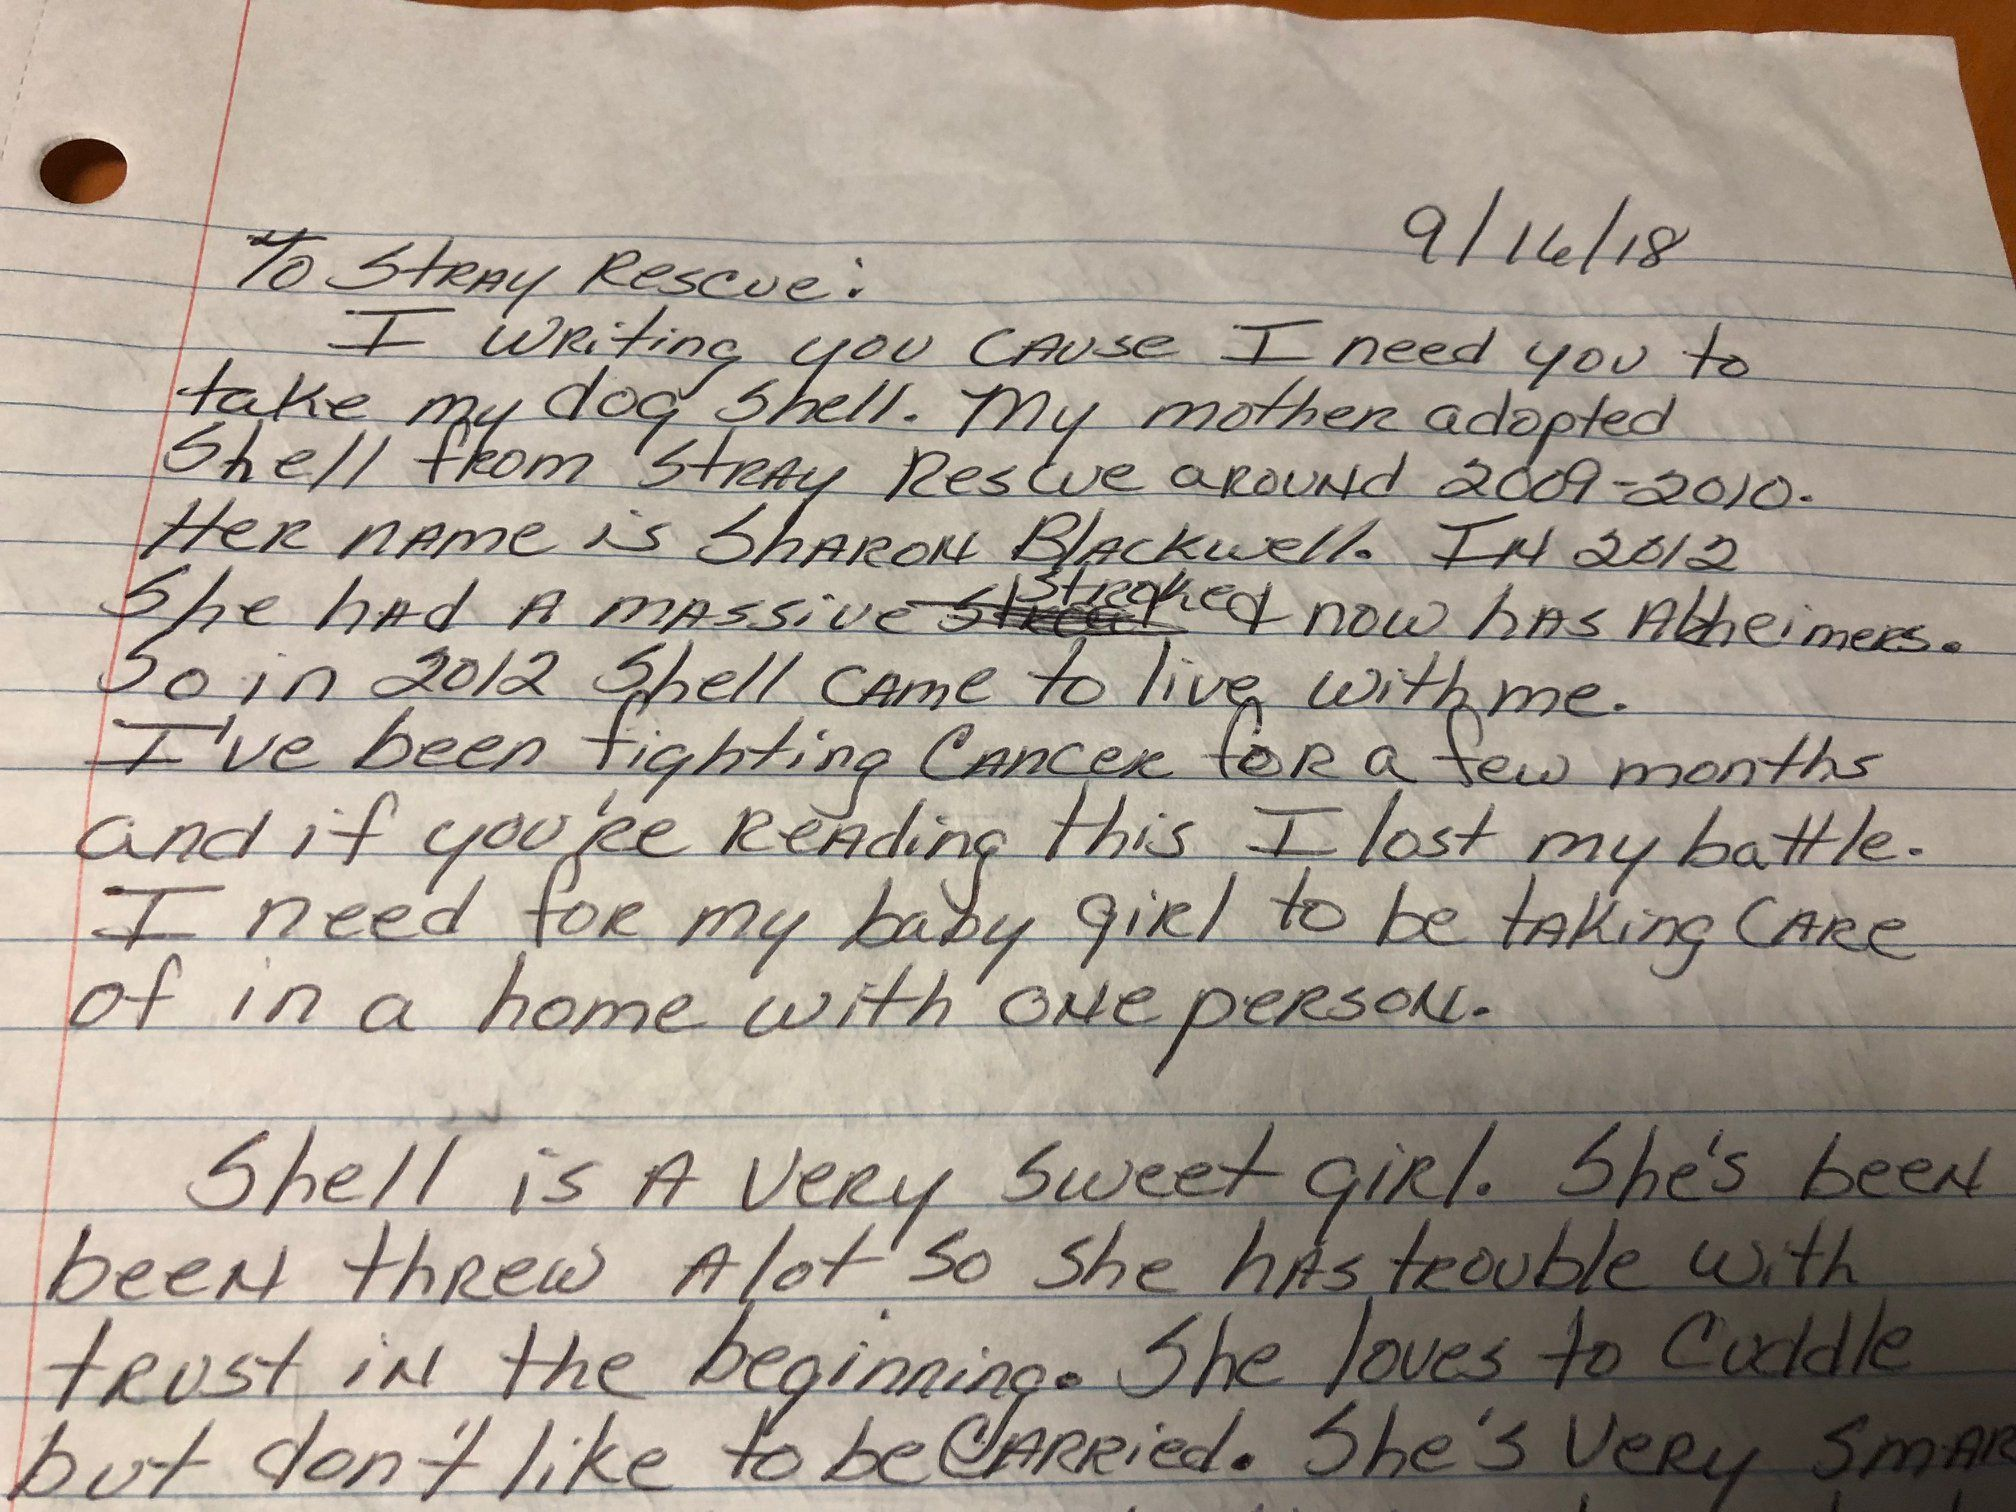 Letter left with dog at shelter